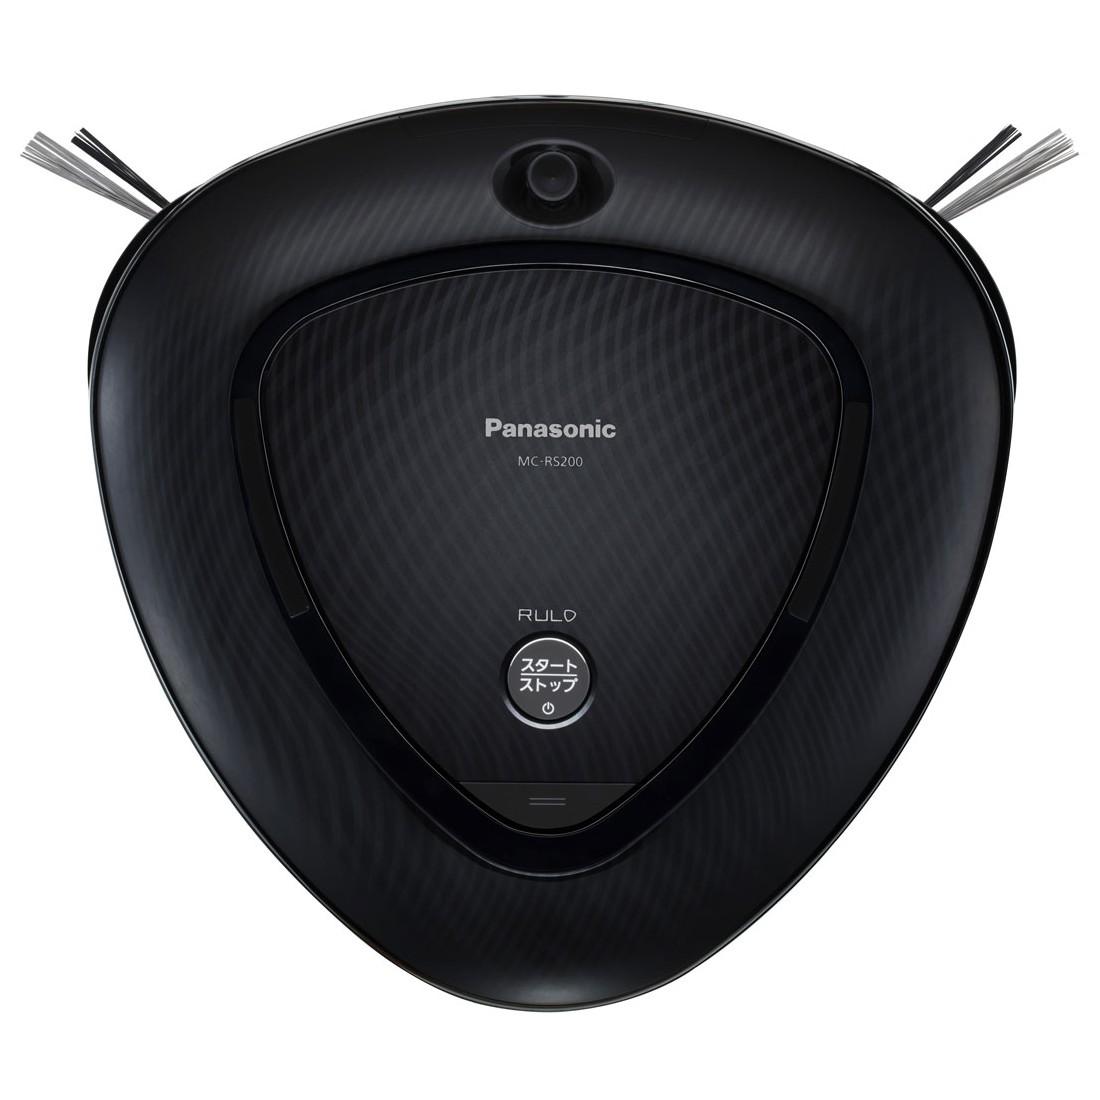 Panasonic パナソニック ロボット掃除機 RULO ルーロ MC-RS200-K ブラック【即納・送料無料】【02P03Dec16】